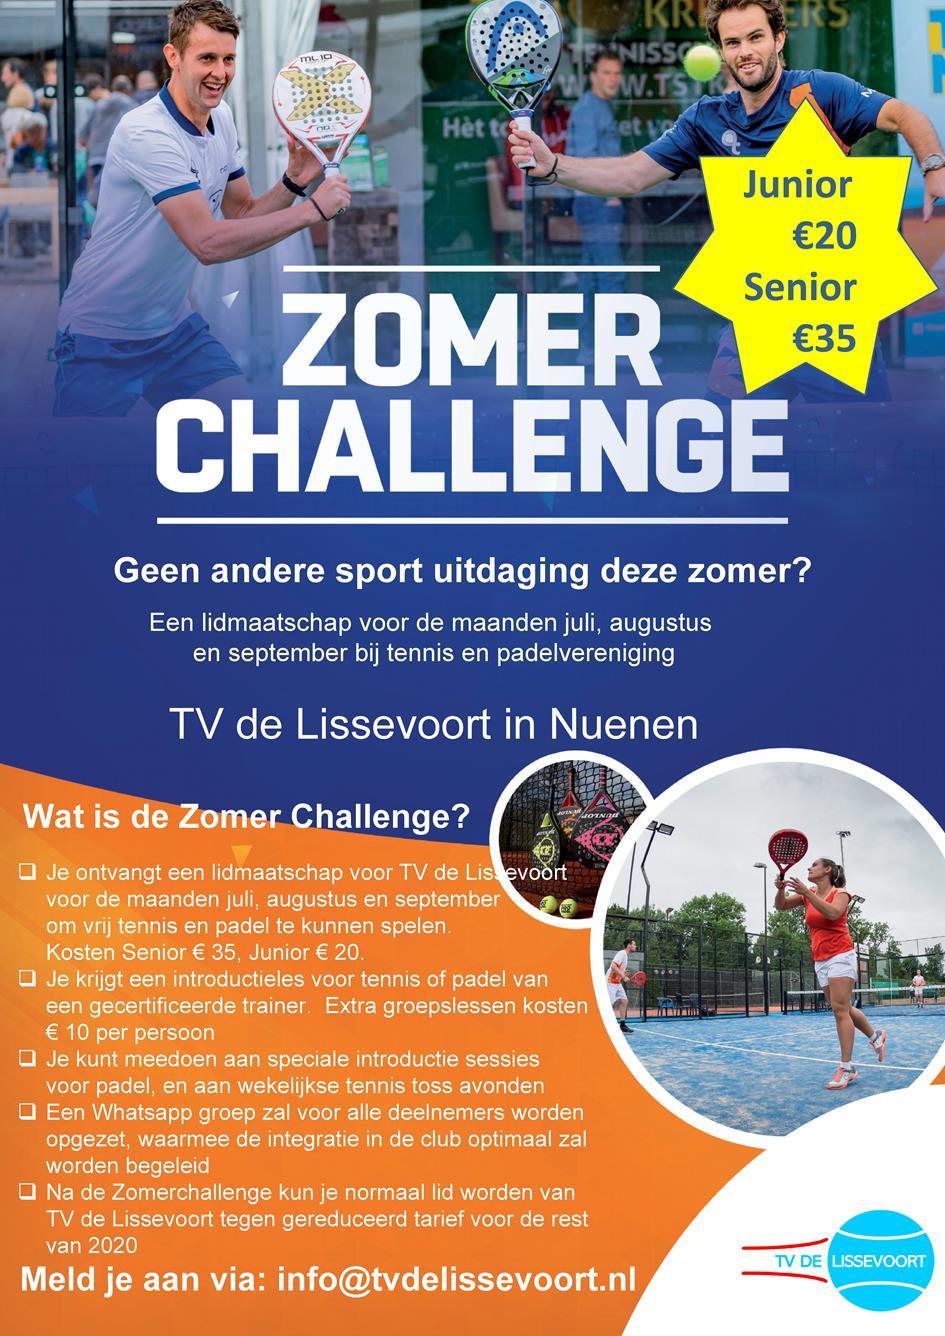 200520 Poster A1 Zomerchallenge 2020 TVL 300dpi.jpg